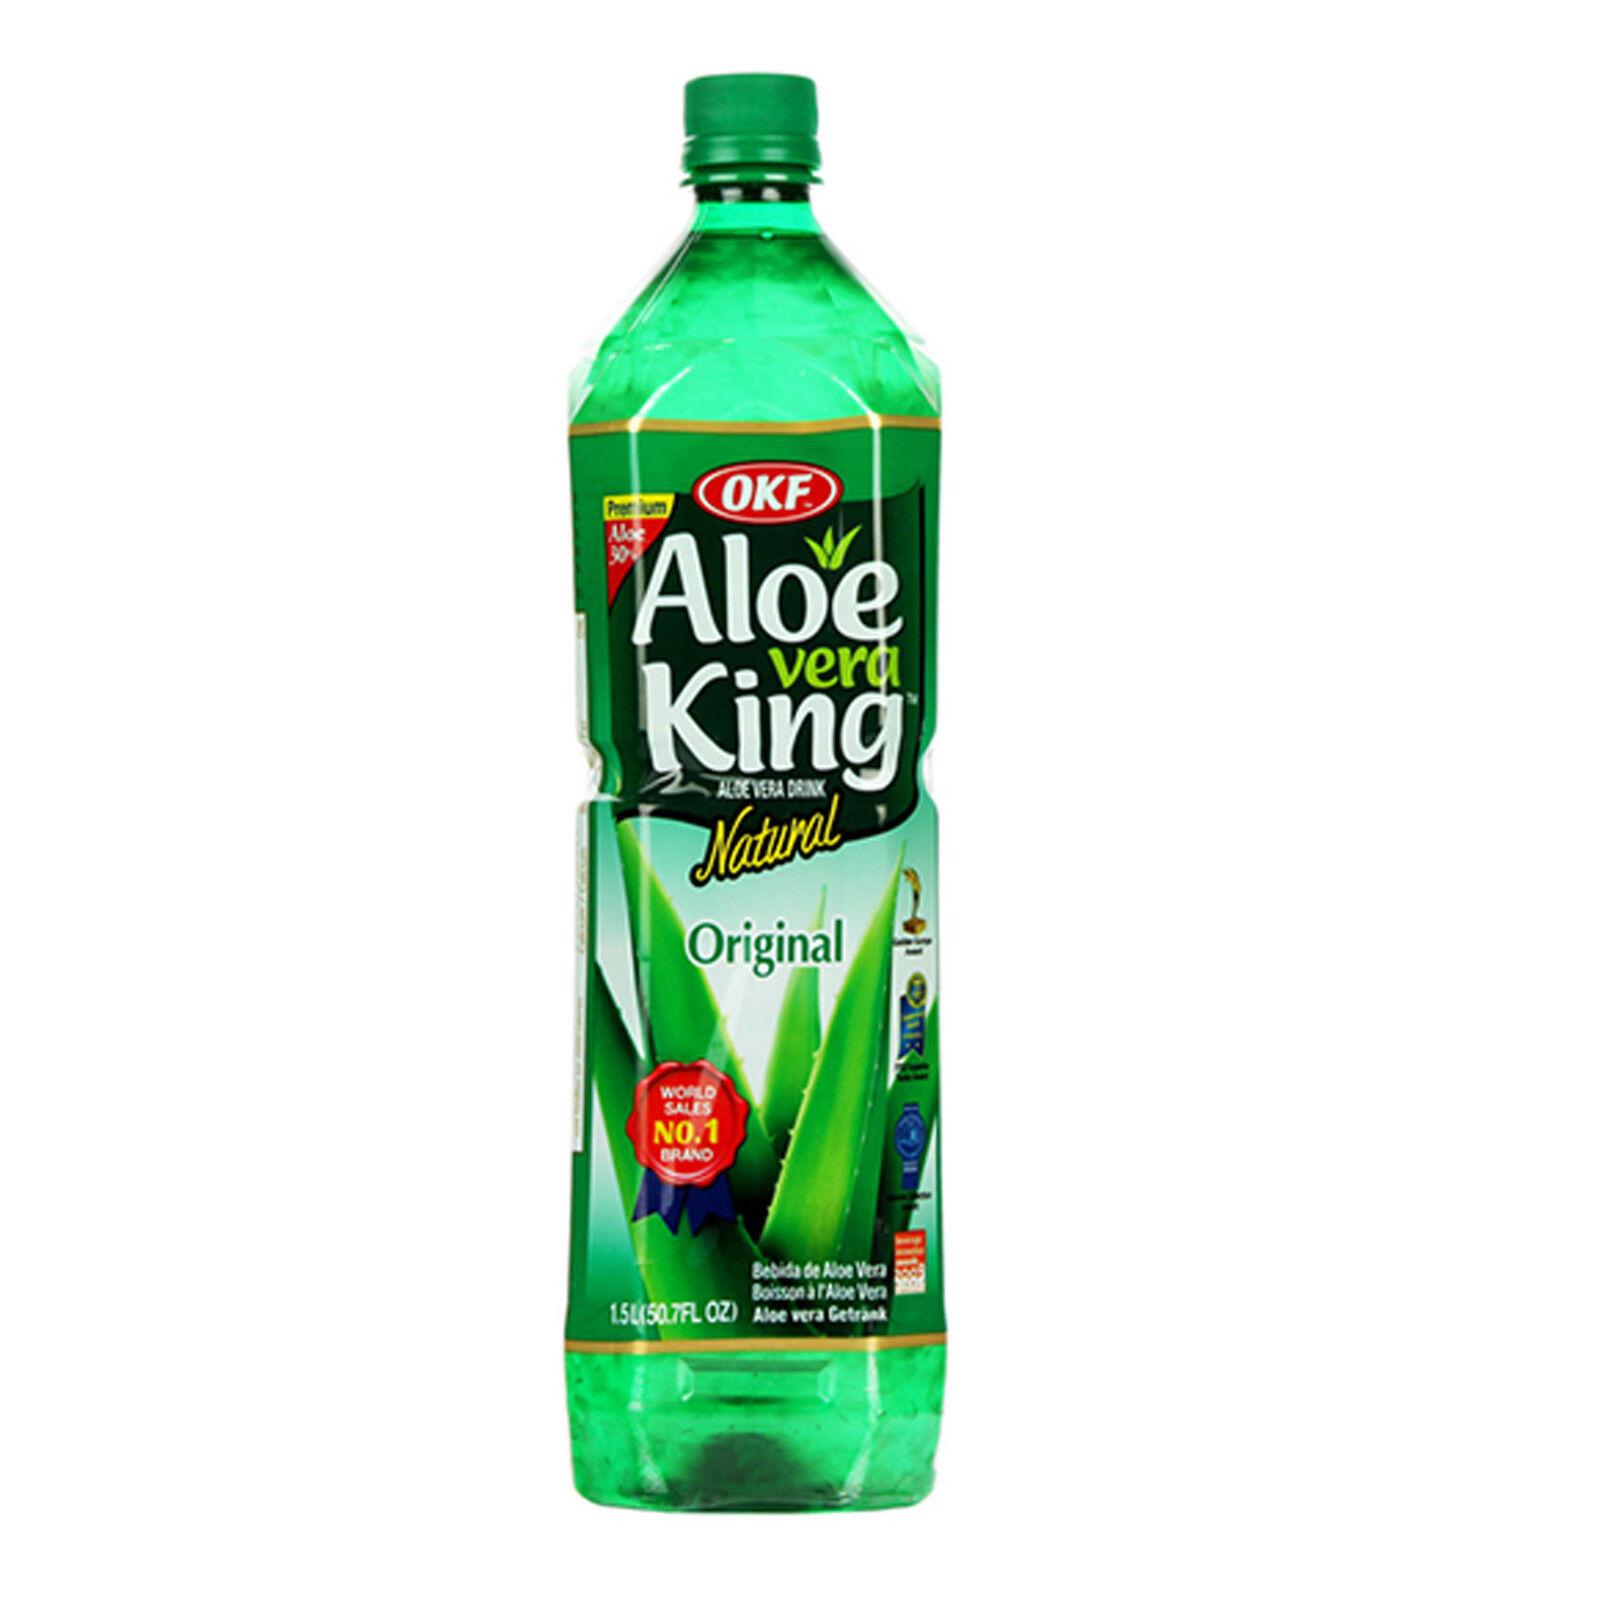 OKF Aloe Vera King Original 12 x 1,5L Aloe Vera Getränk Drink - OKF 18 Liter NEU